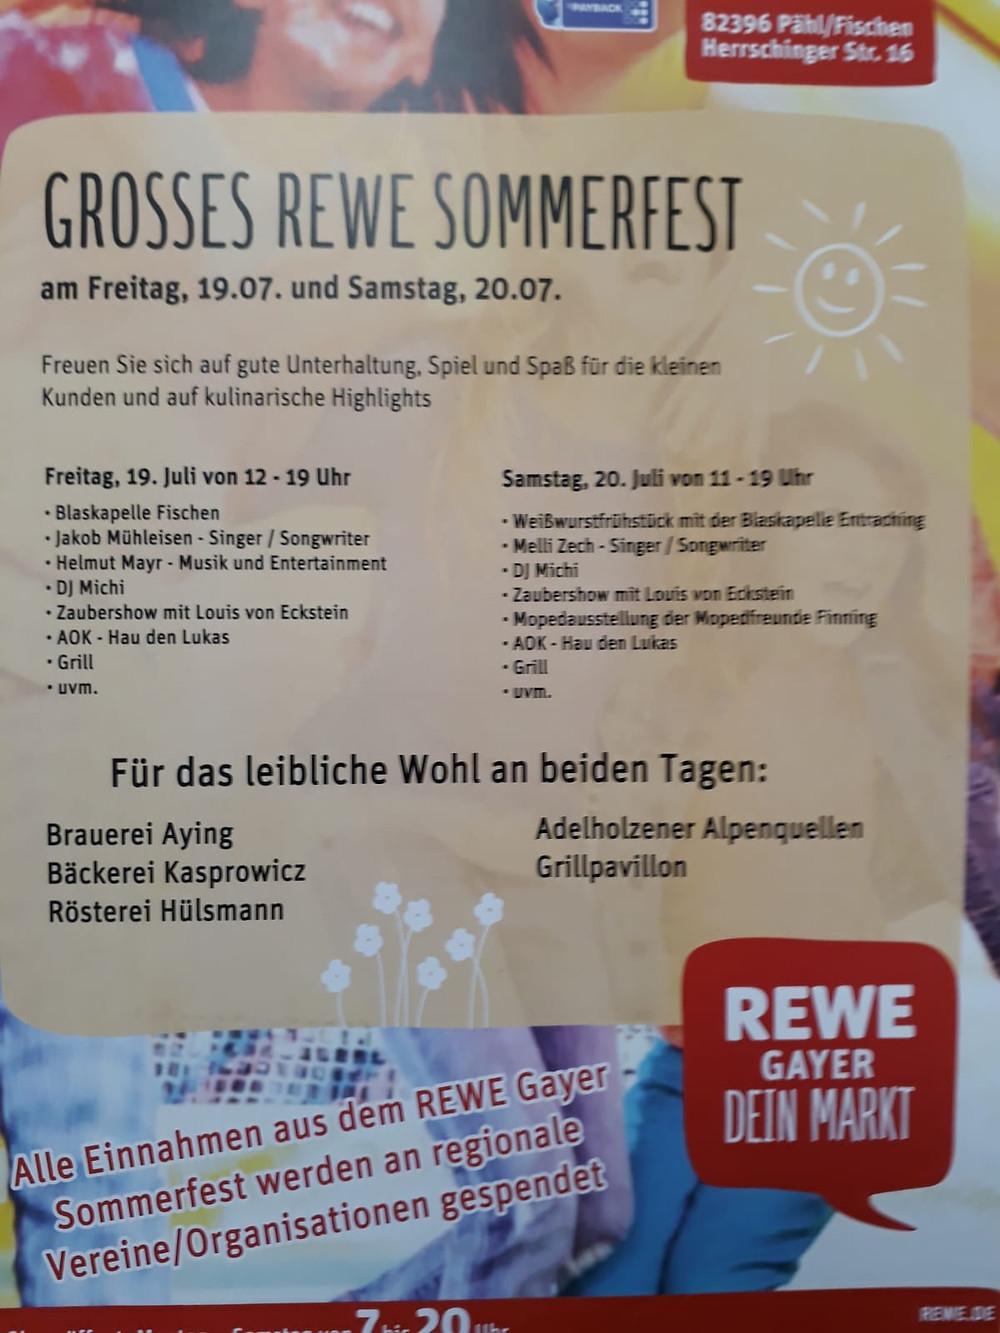 Großes REWE Sommerfest